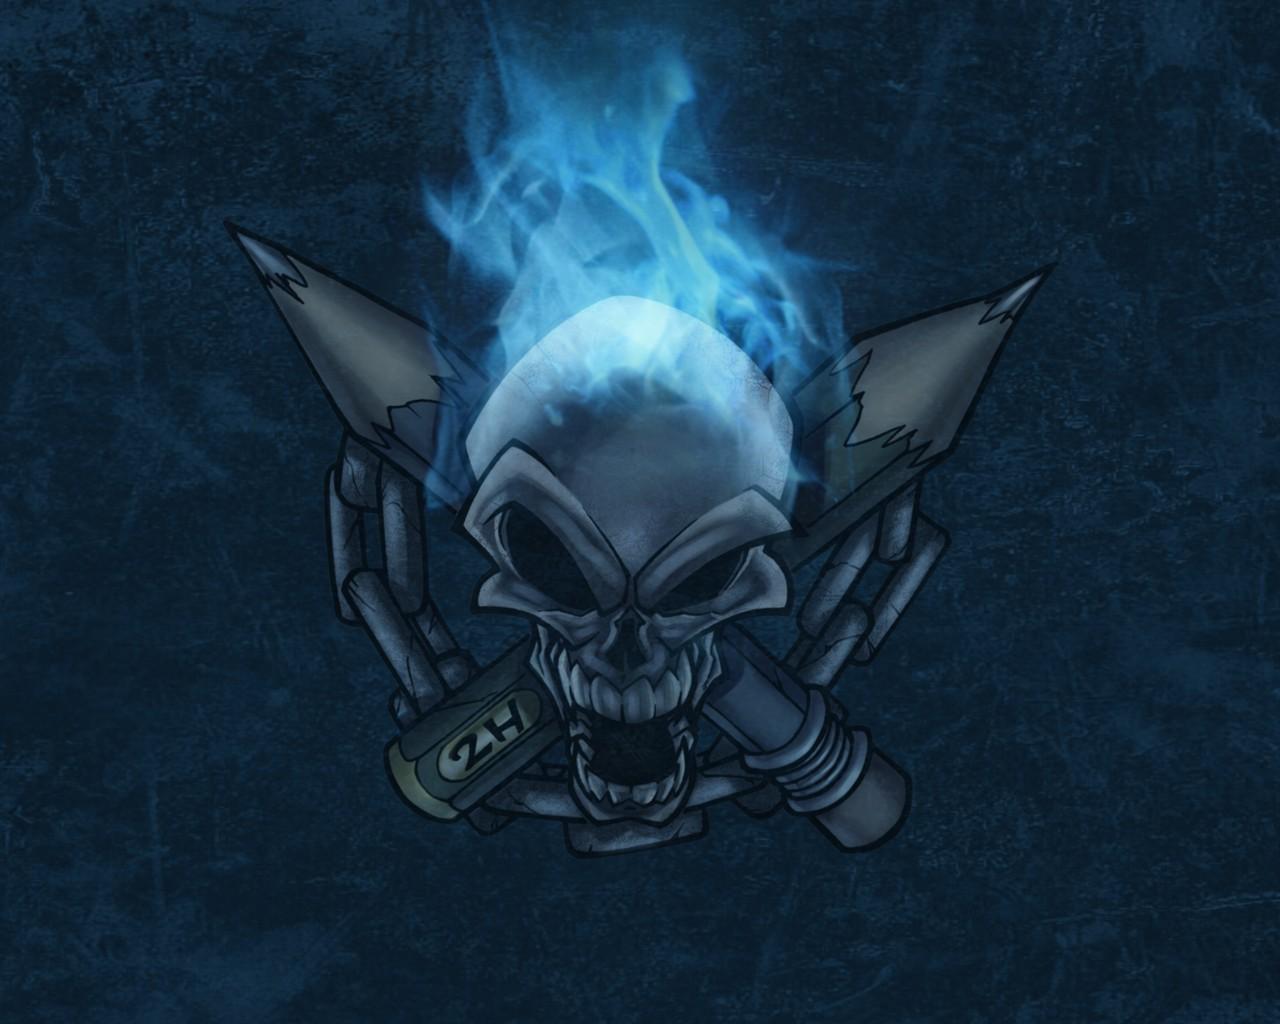 blue flames skull wallpaper 1280x1024